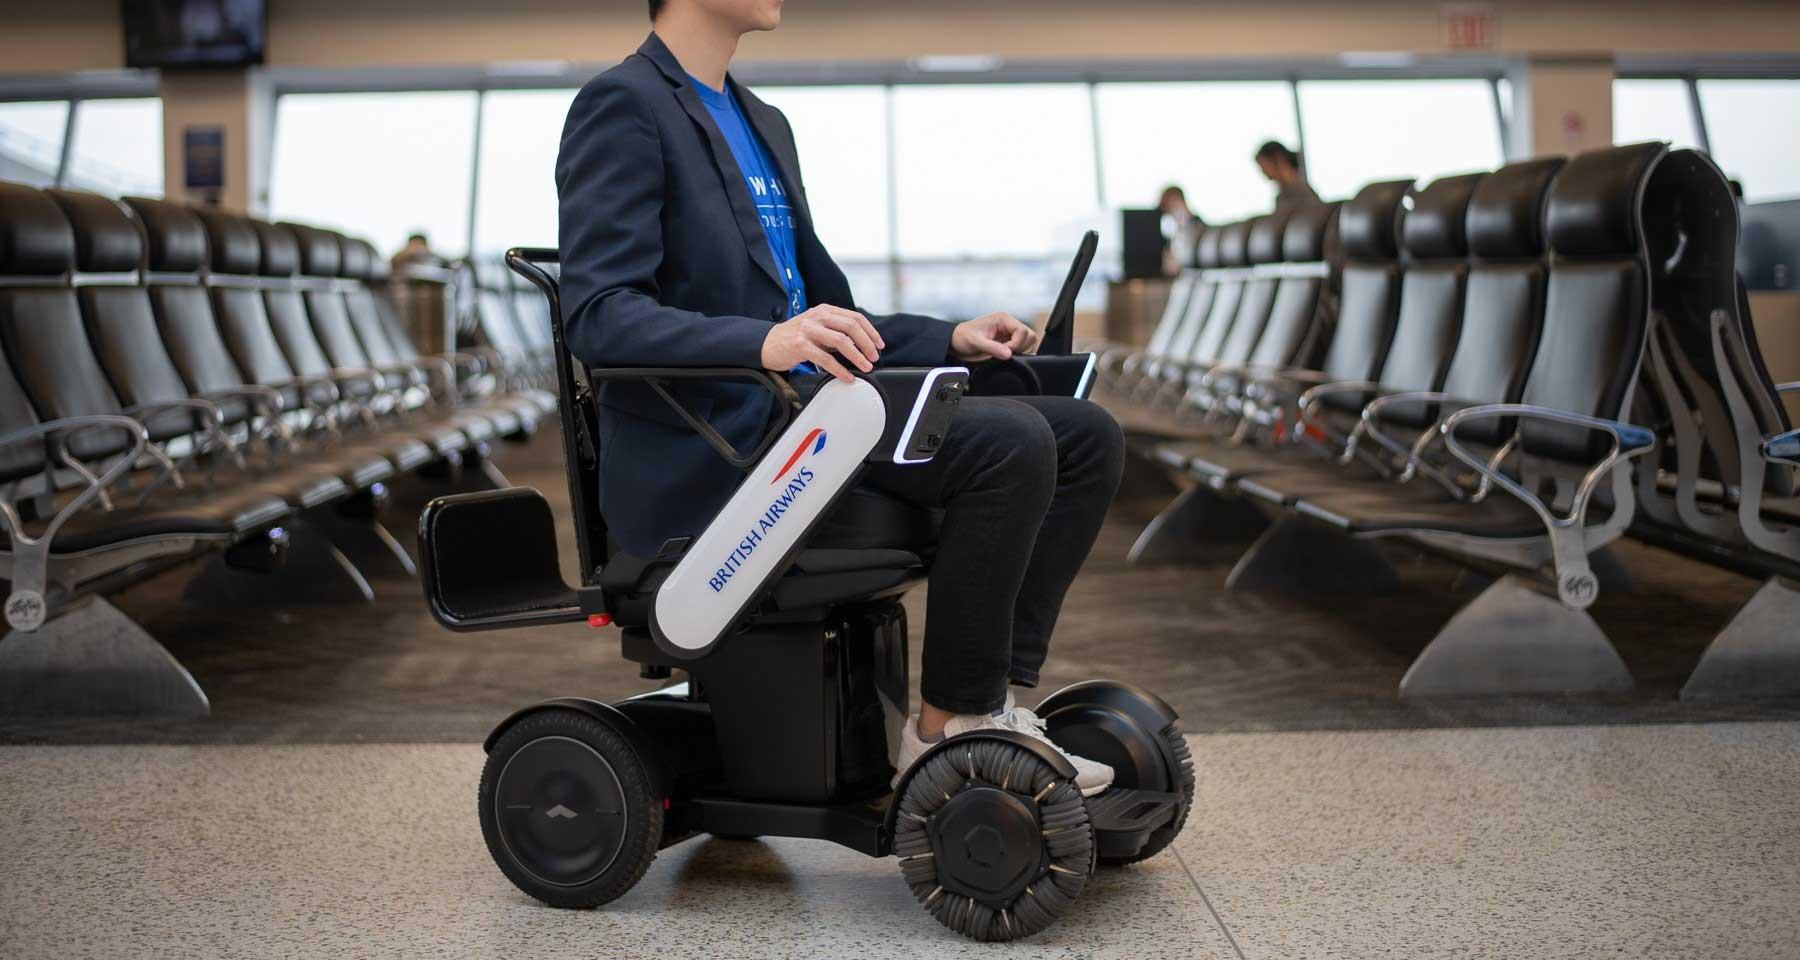 Man riding on autonomous BA branded wheelchair.